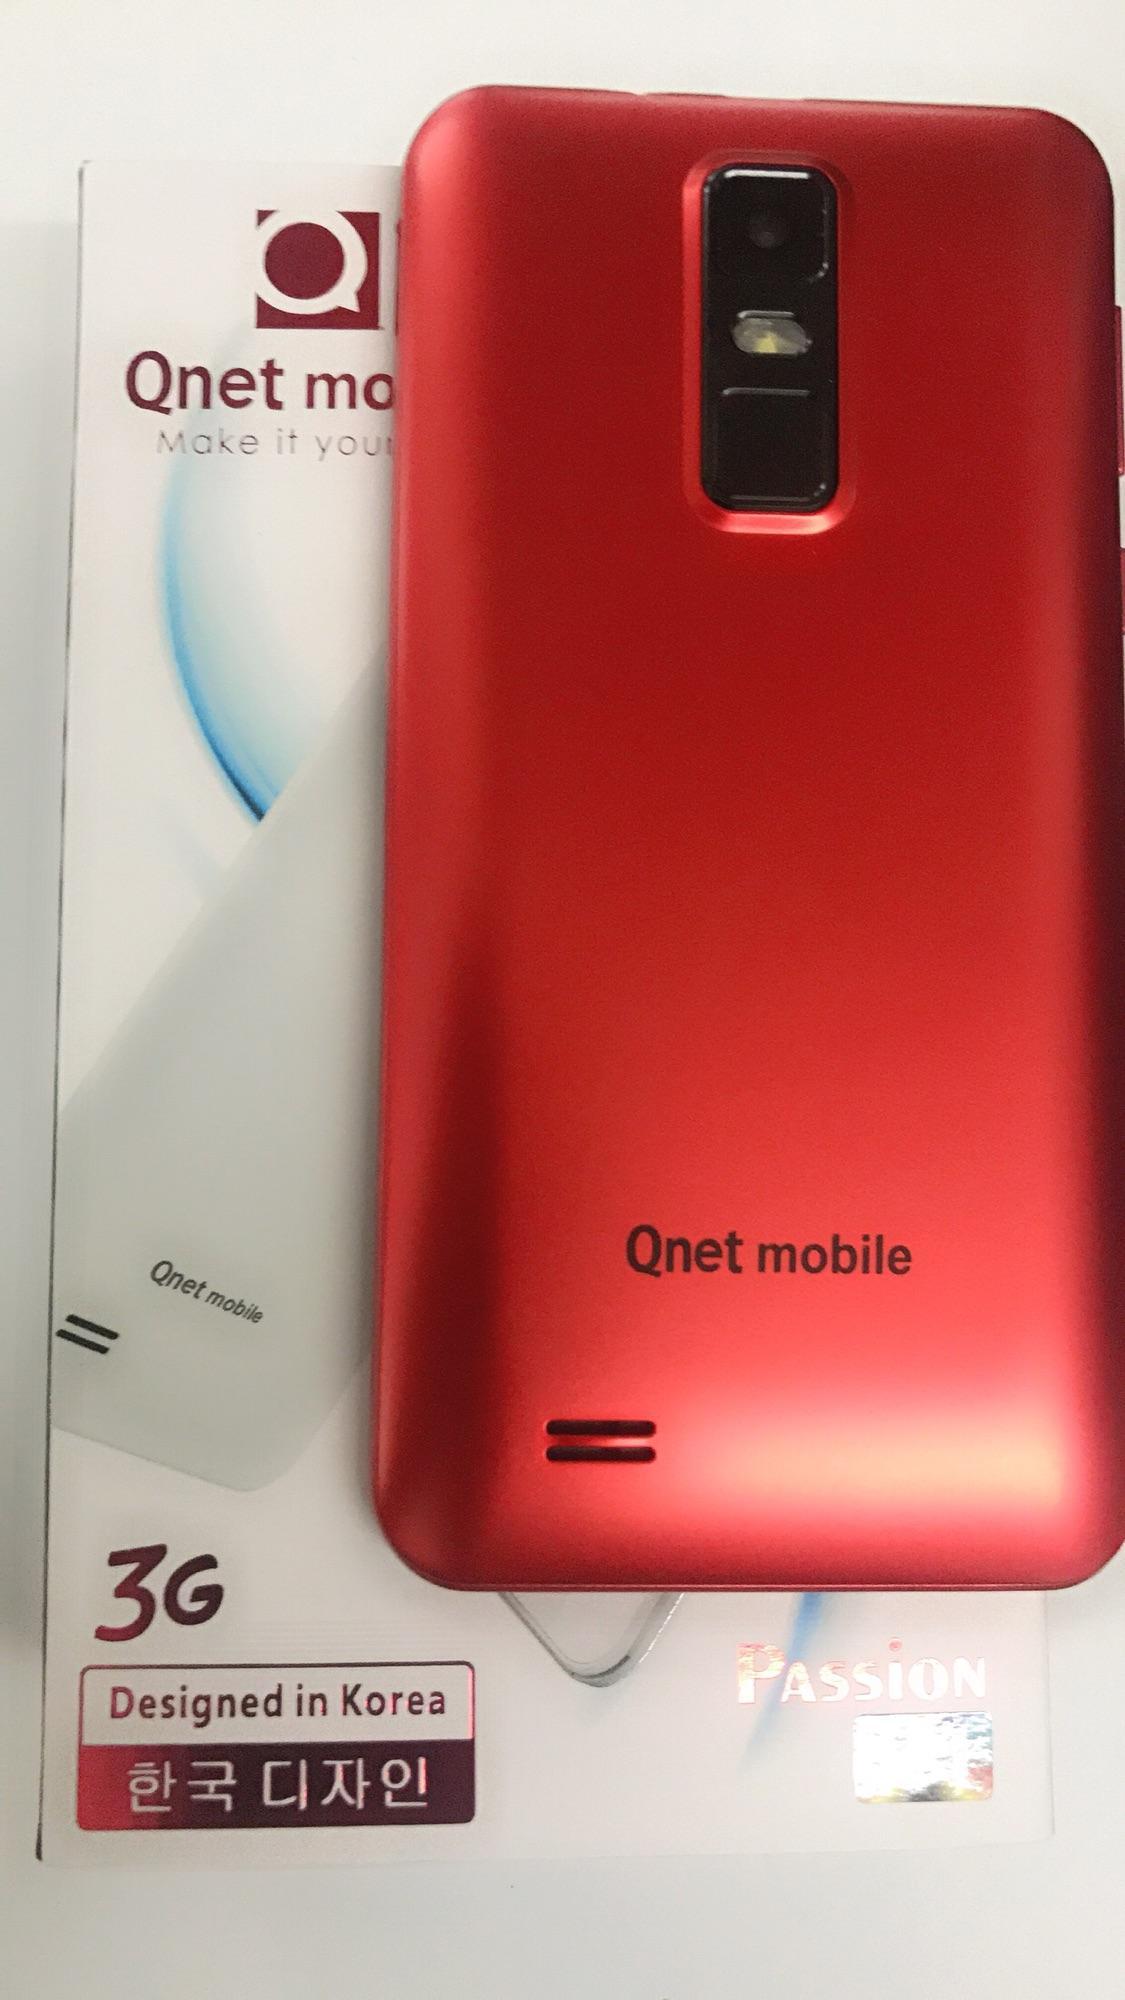 qnet mobile